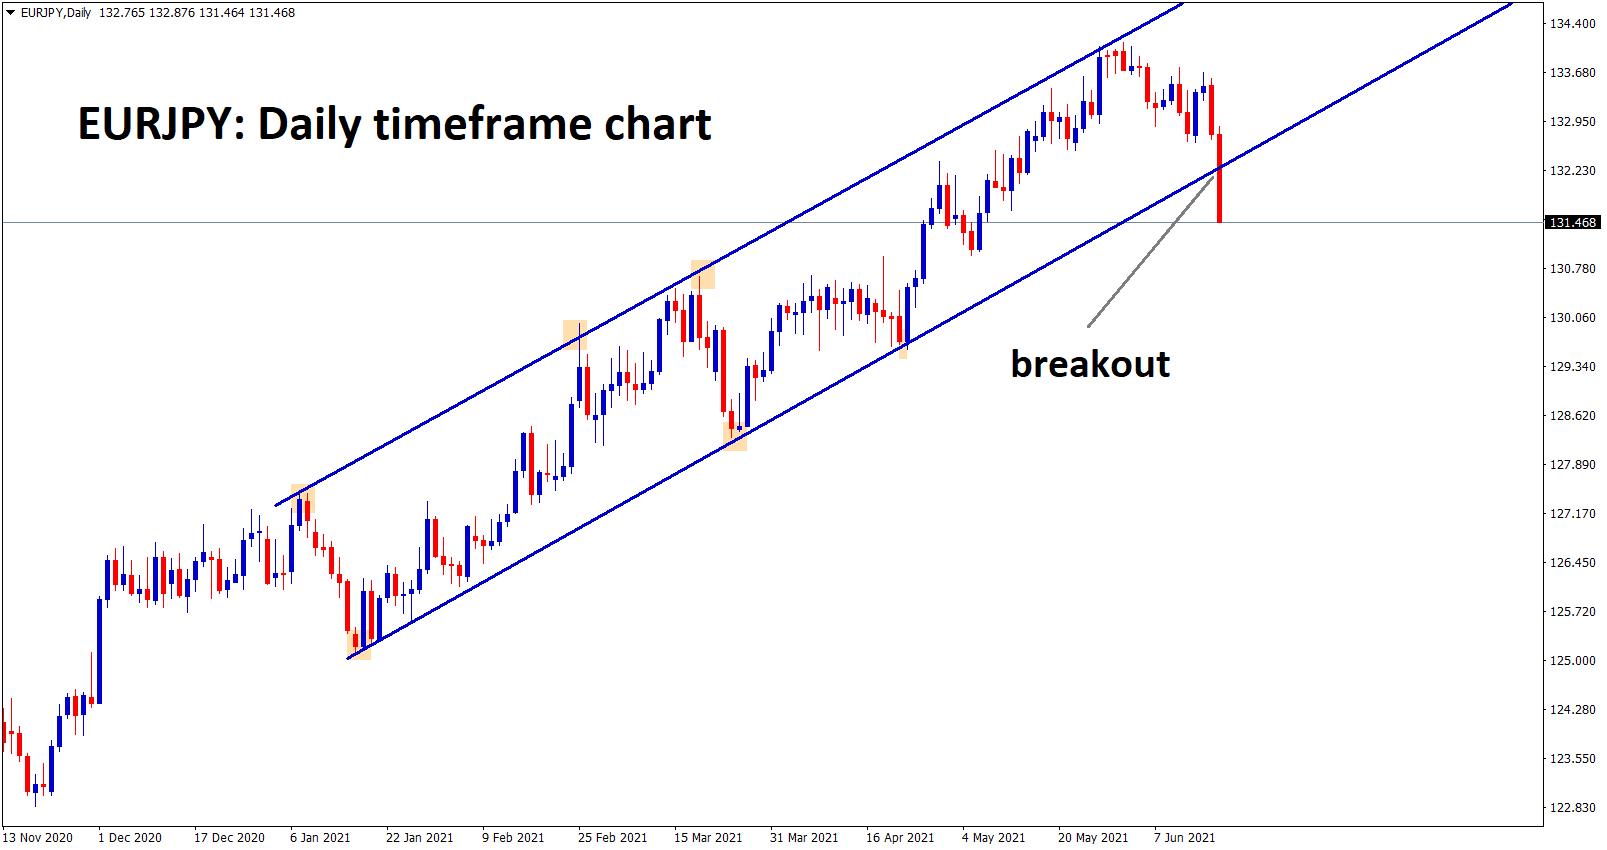 EURJPY has broken the bottom level of the major uptrend line